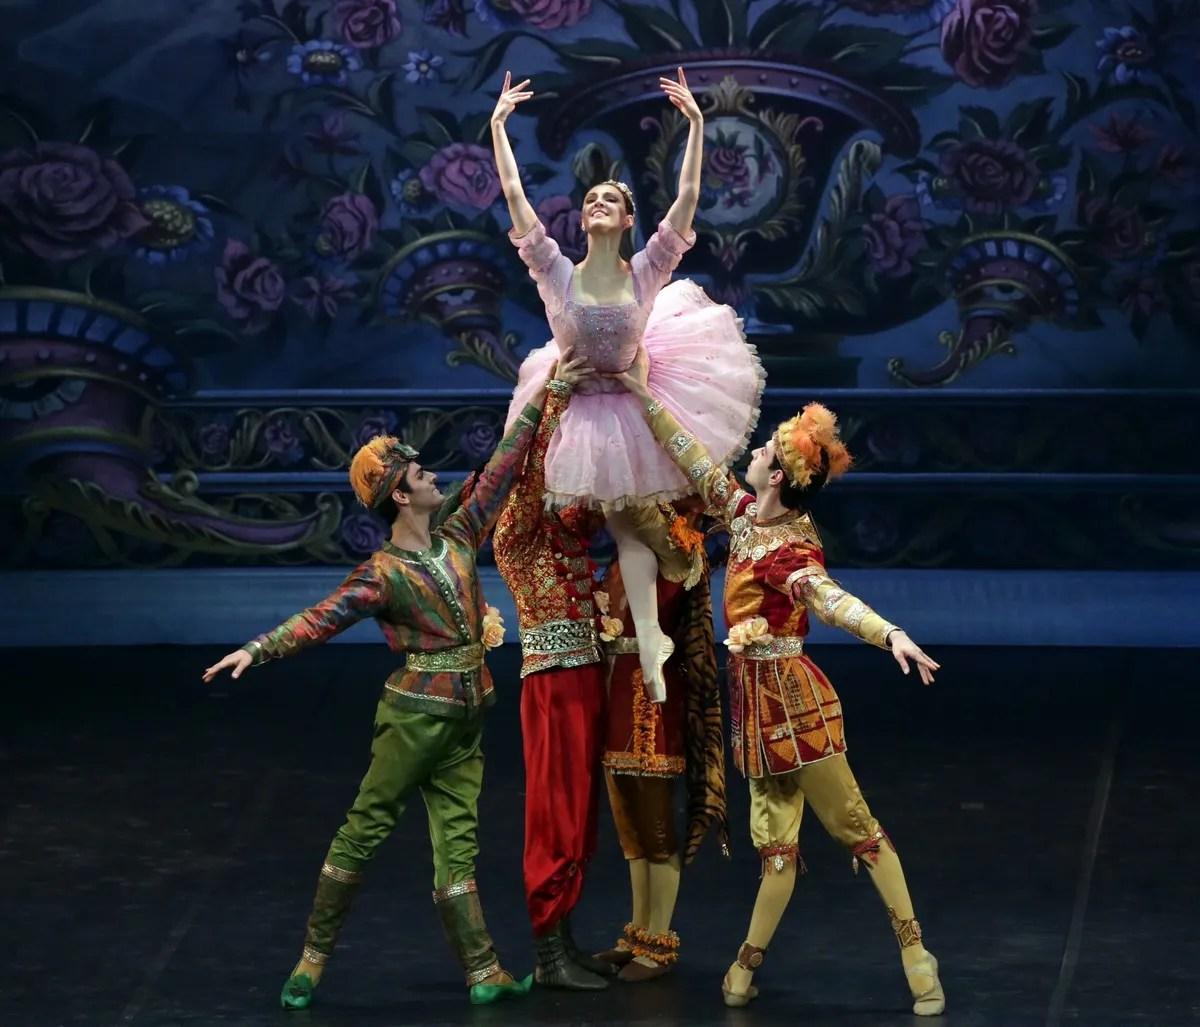 Sleeping Beauty - Martina Arduino, Starace, Caporaletti, Zeni, Garon, photo by Brescia e Amisano ©Teatro alla Scala